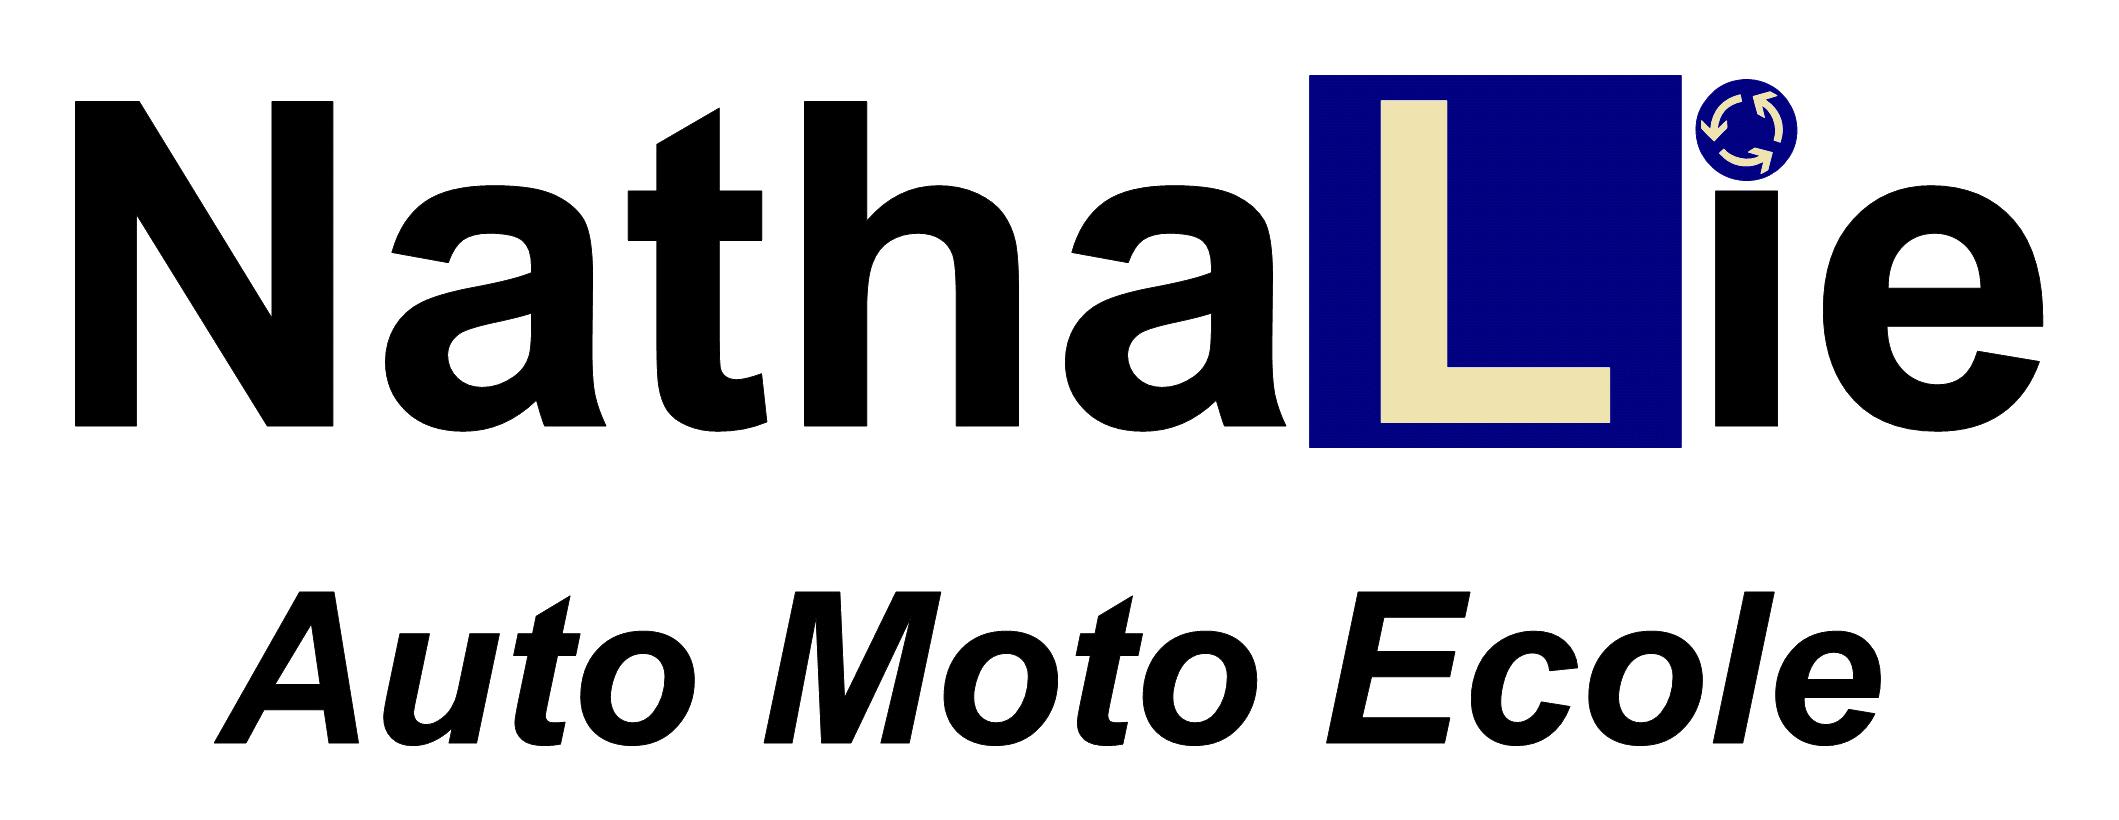 NathaLie Auto-Moto